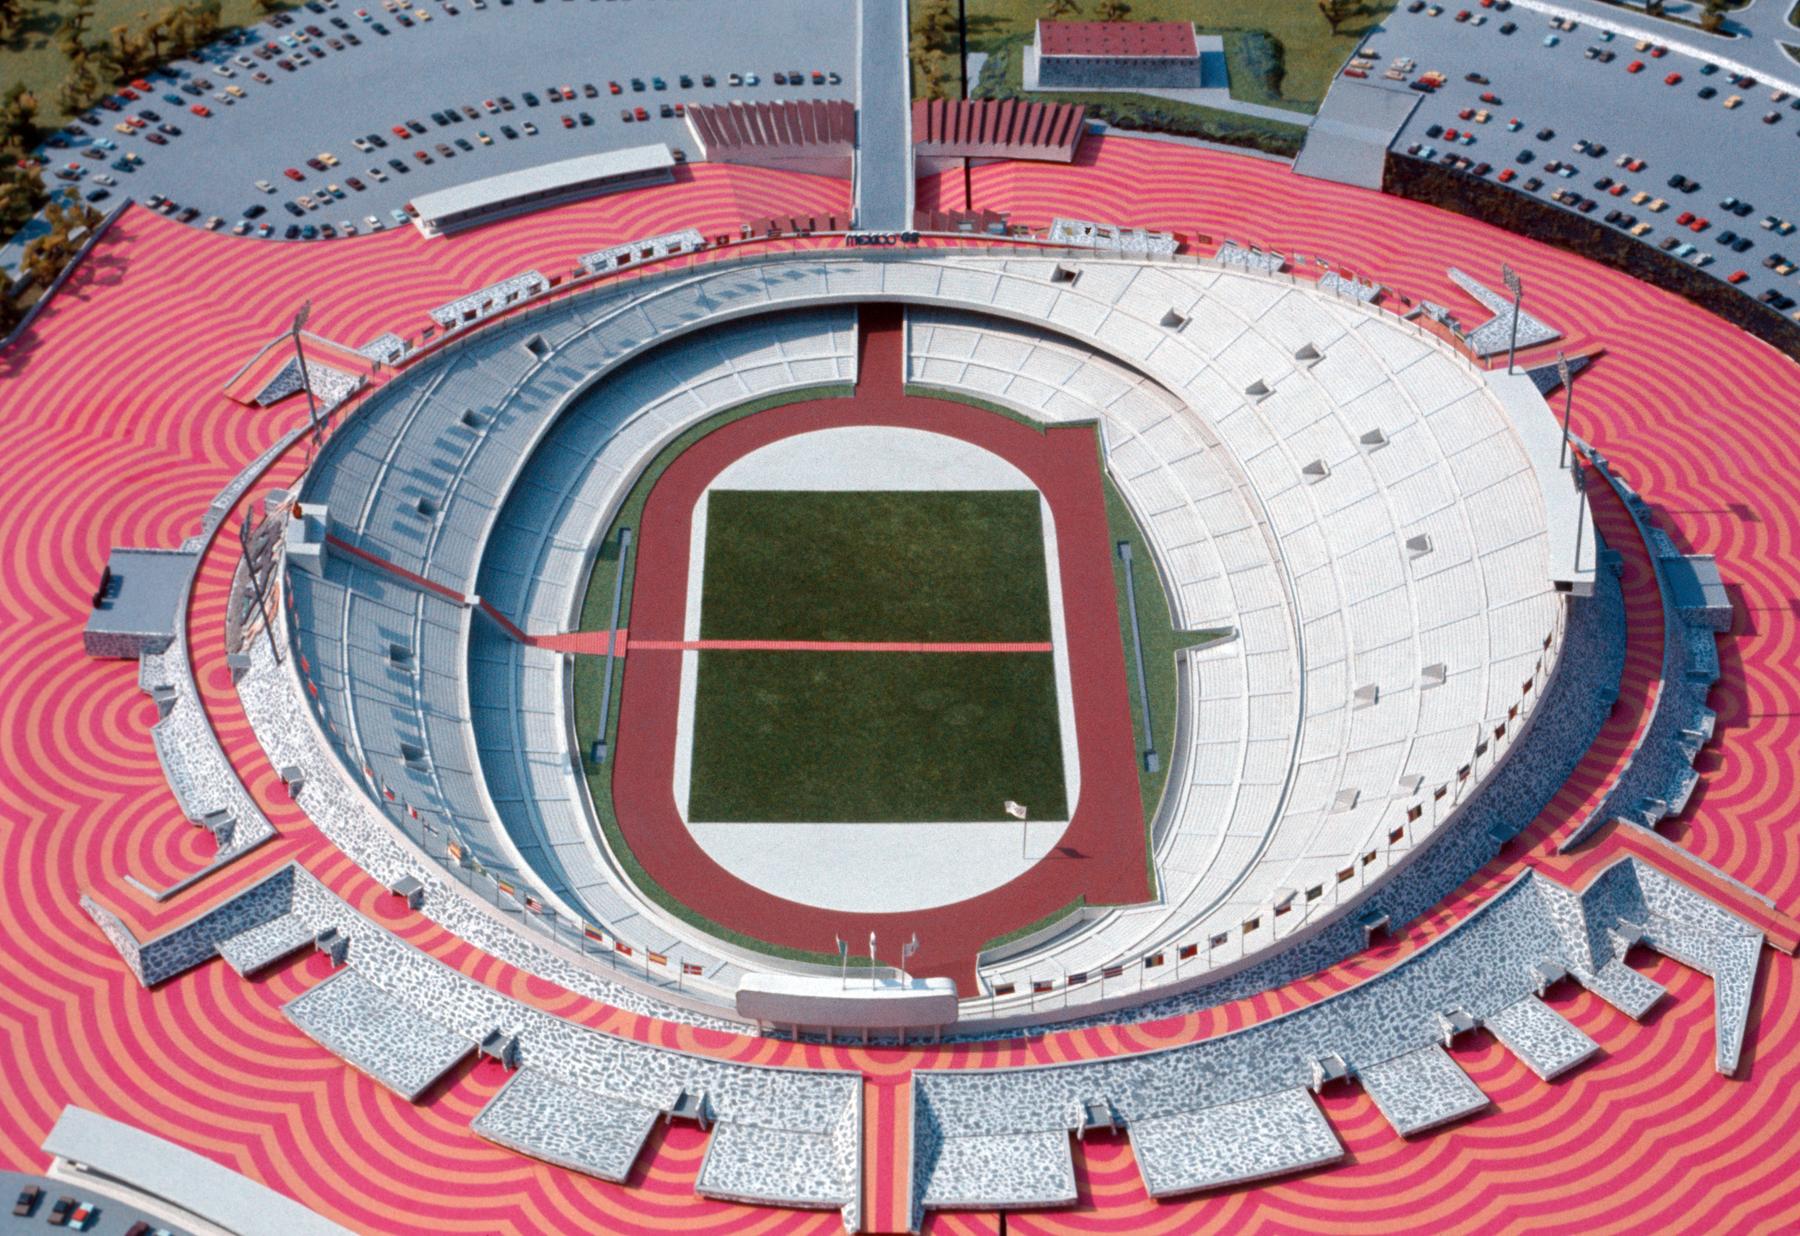 an empty stadium from bird's eye biew